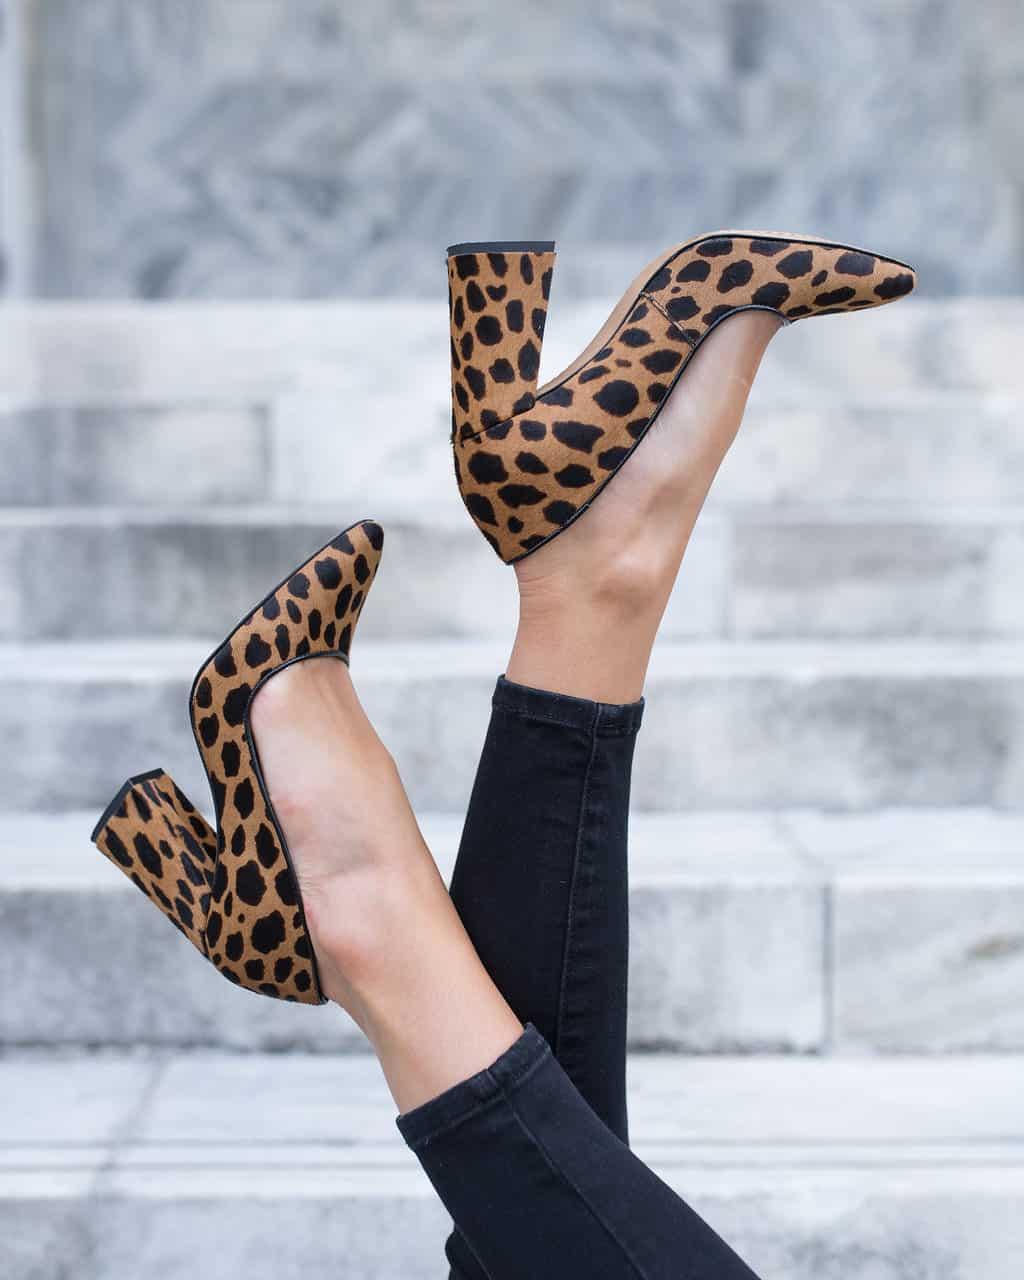 The Perfect Leopard Print Pumps